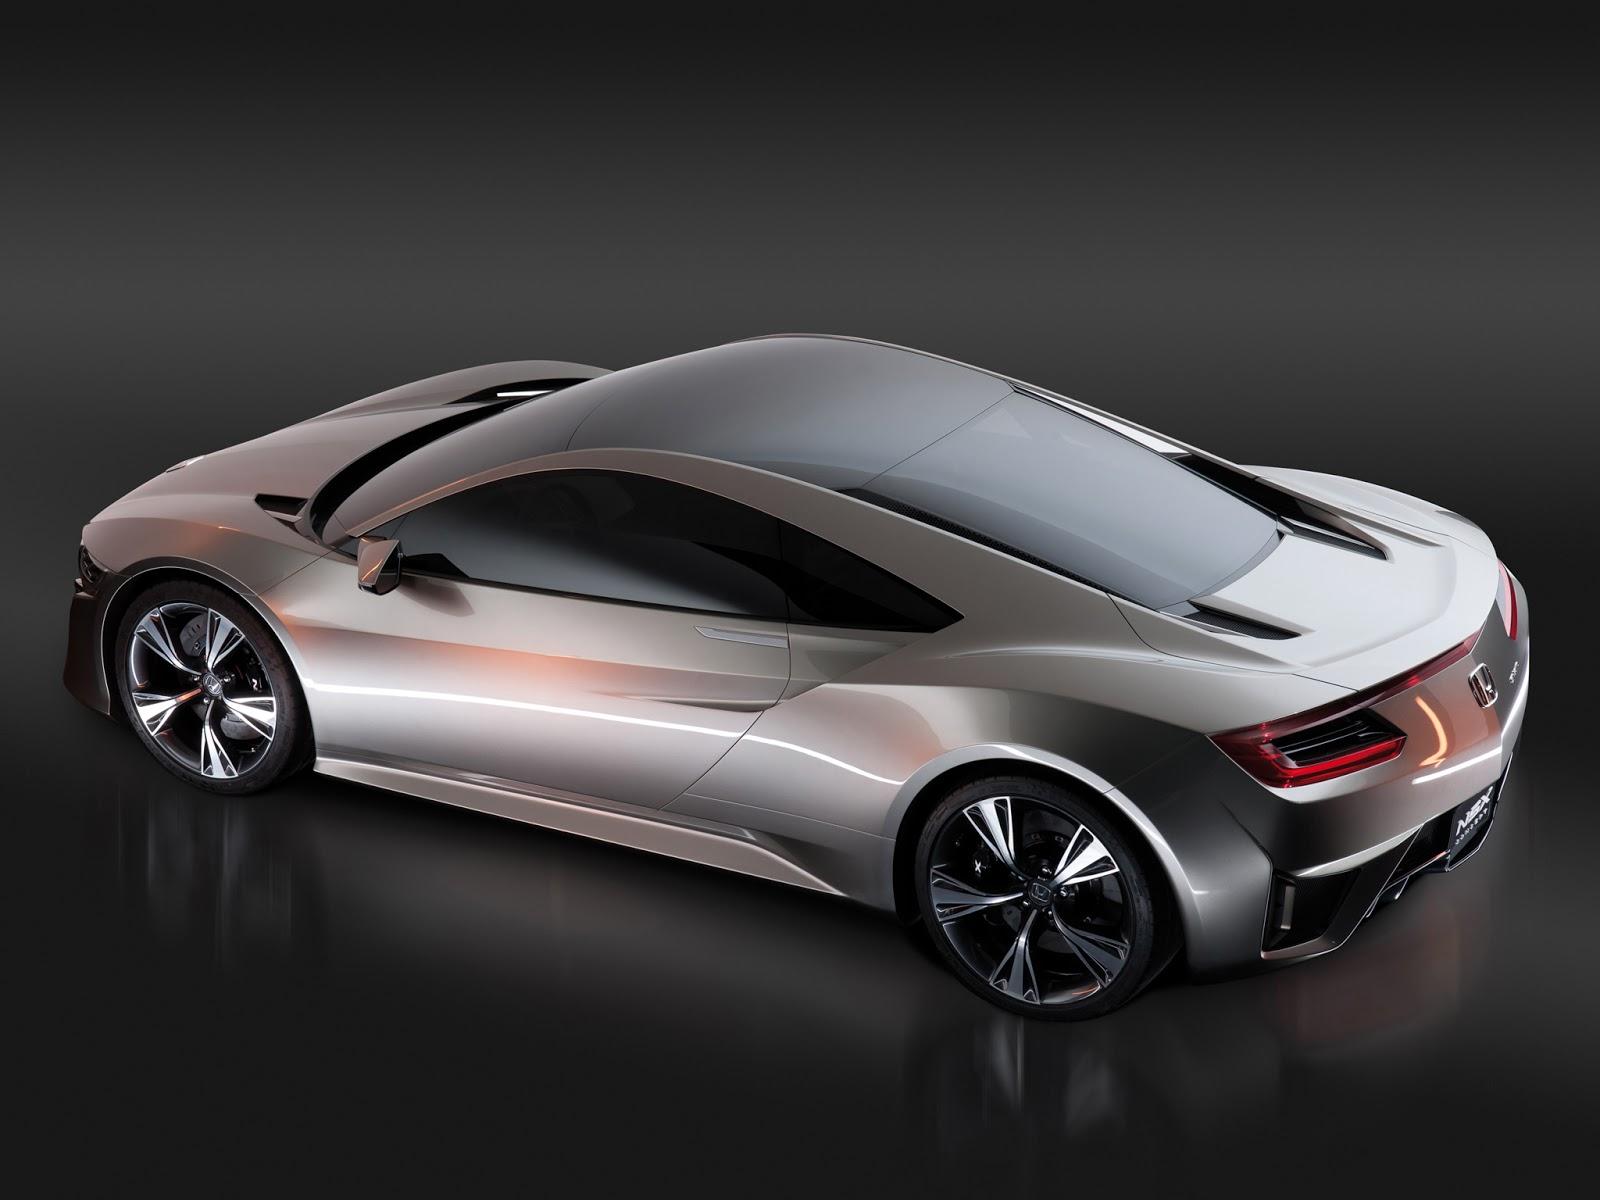 2012 Honda Nsx Concept Auto Cars Concept